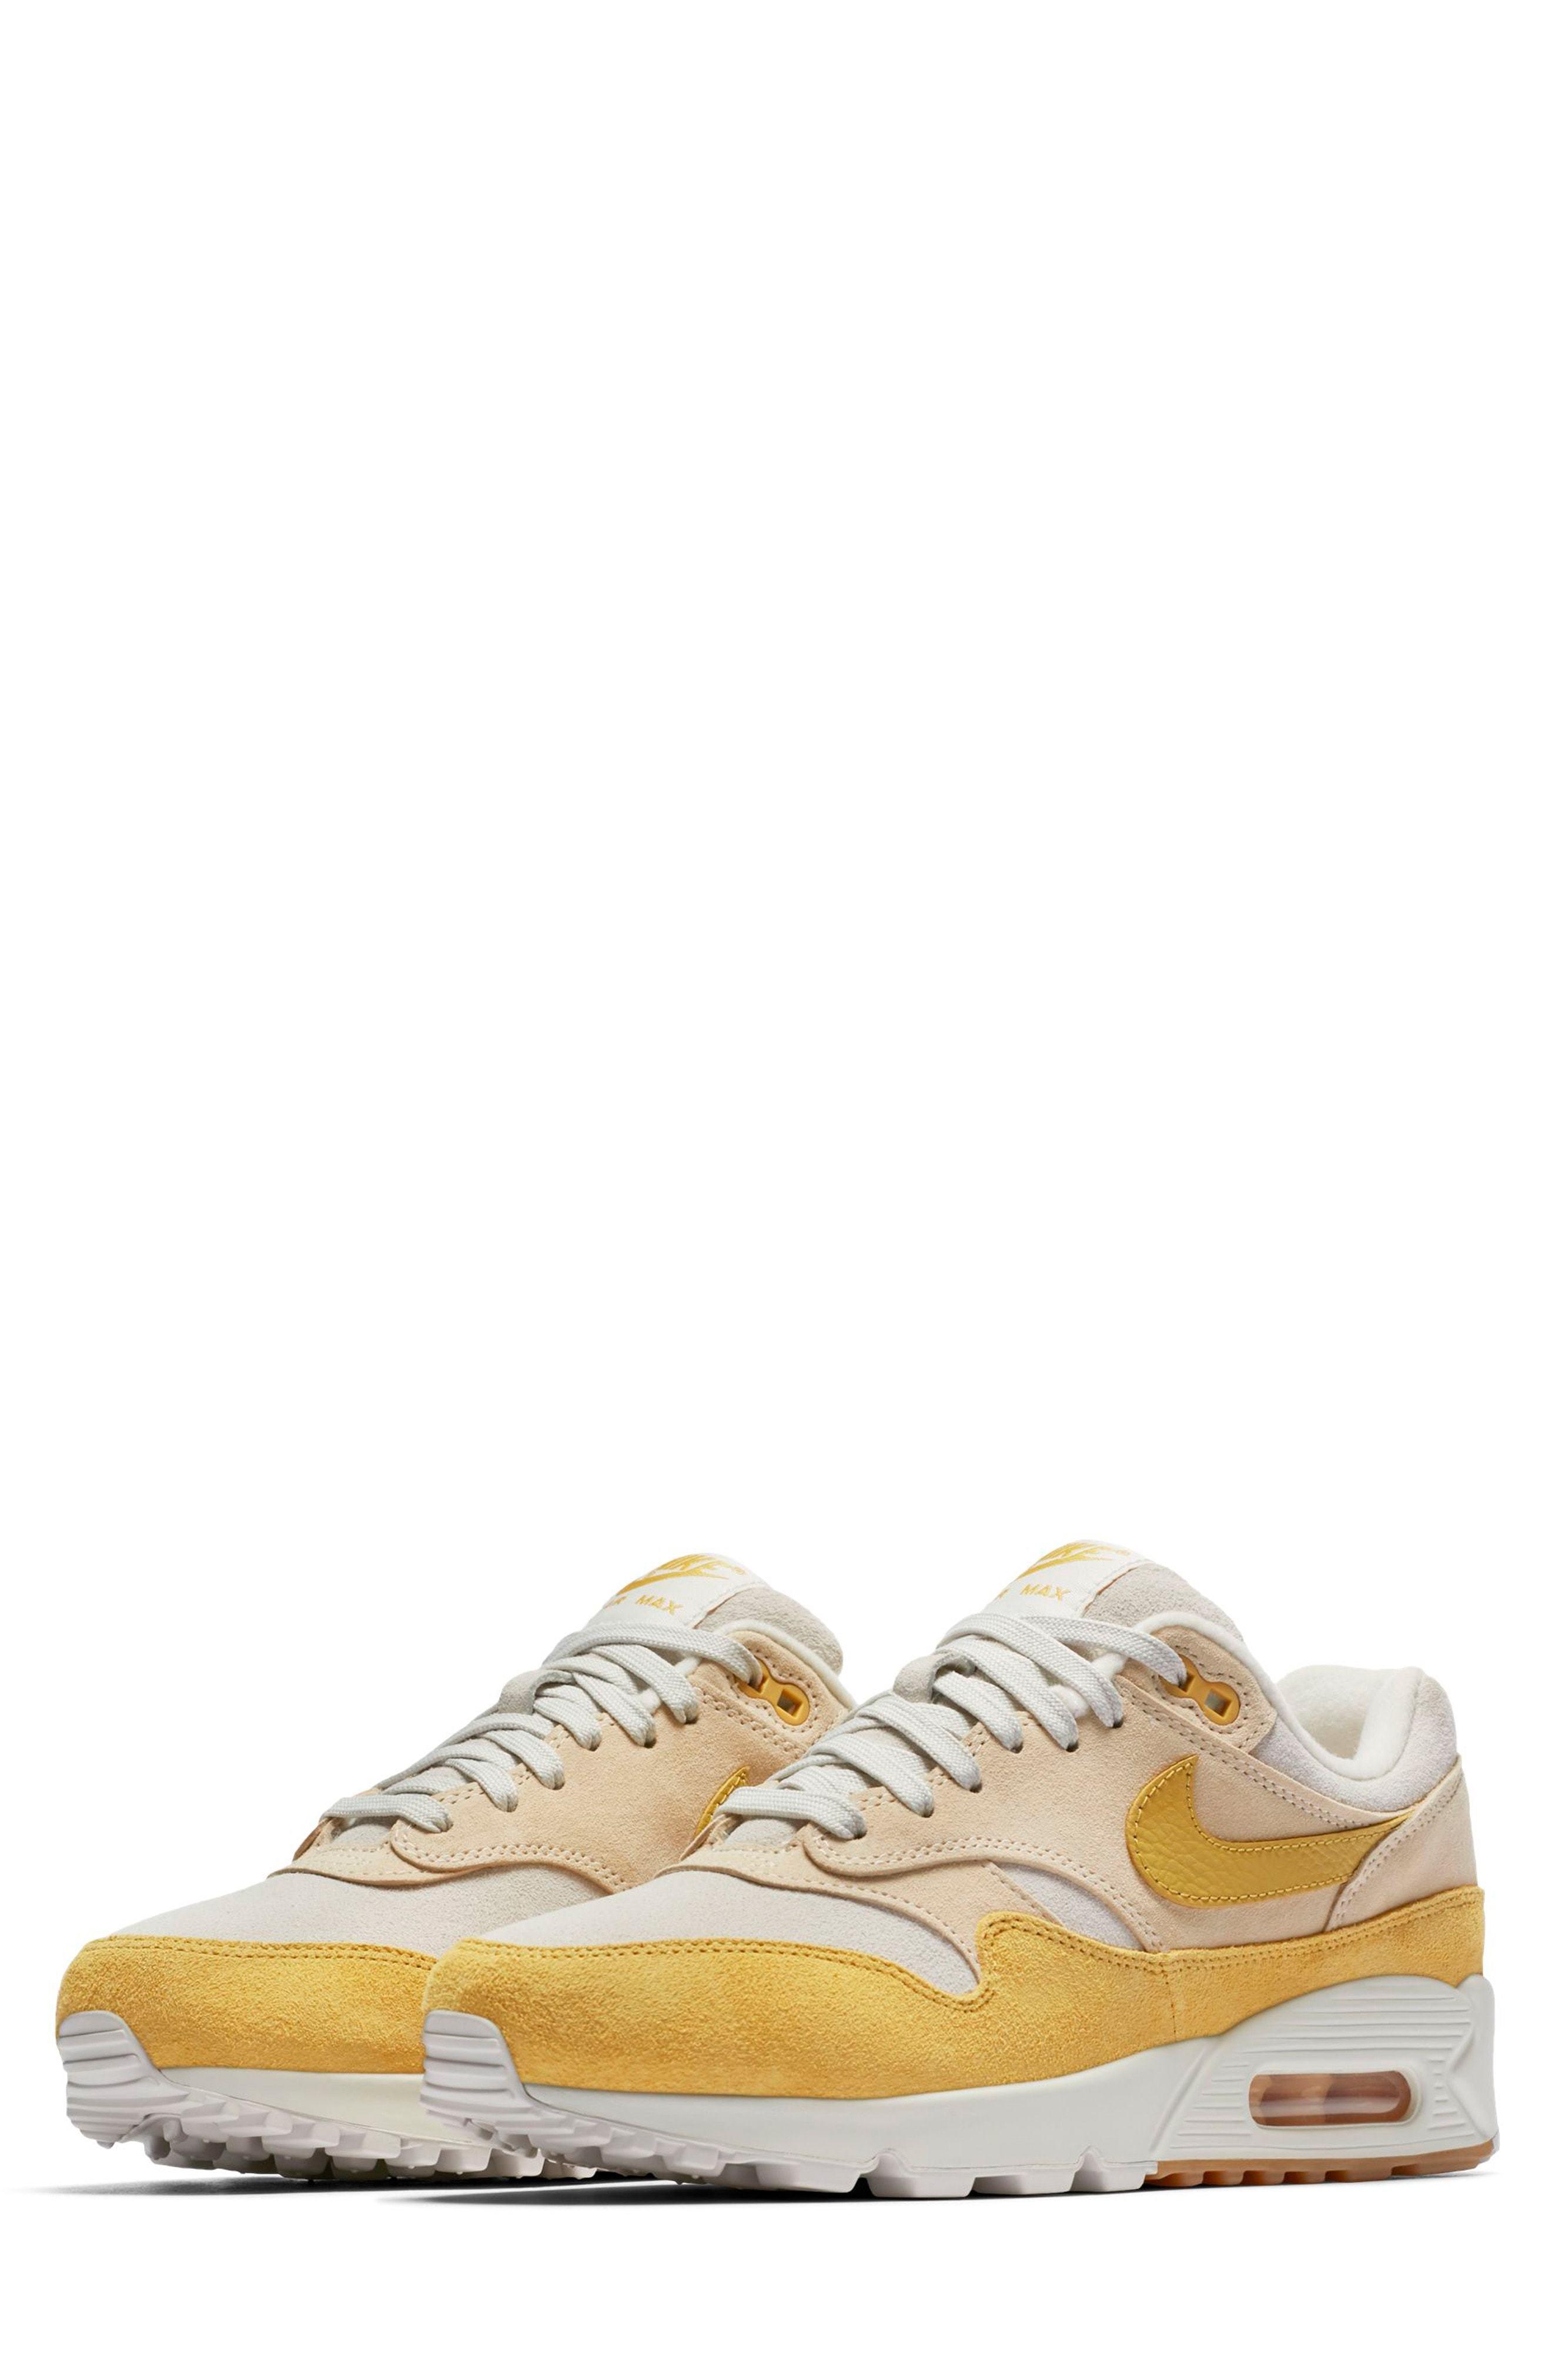 huge selection of 479e3 a1b32 ... Sneakers Nike Air Max 901 Sneaker